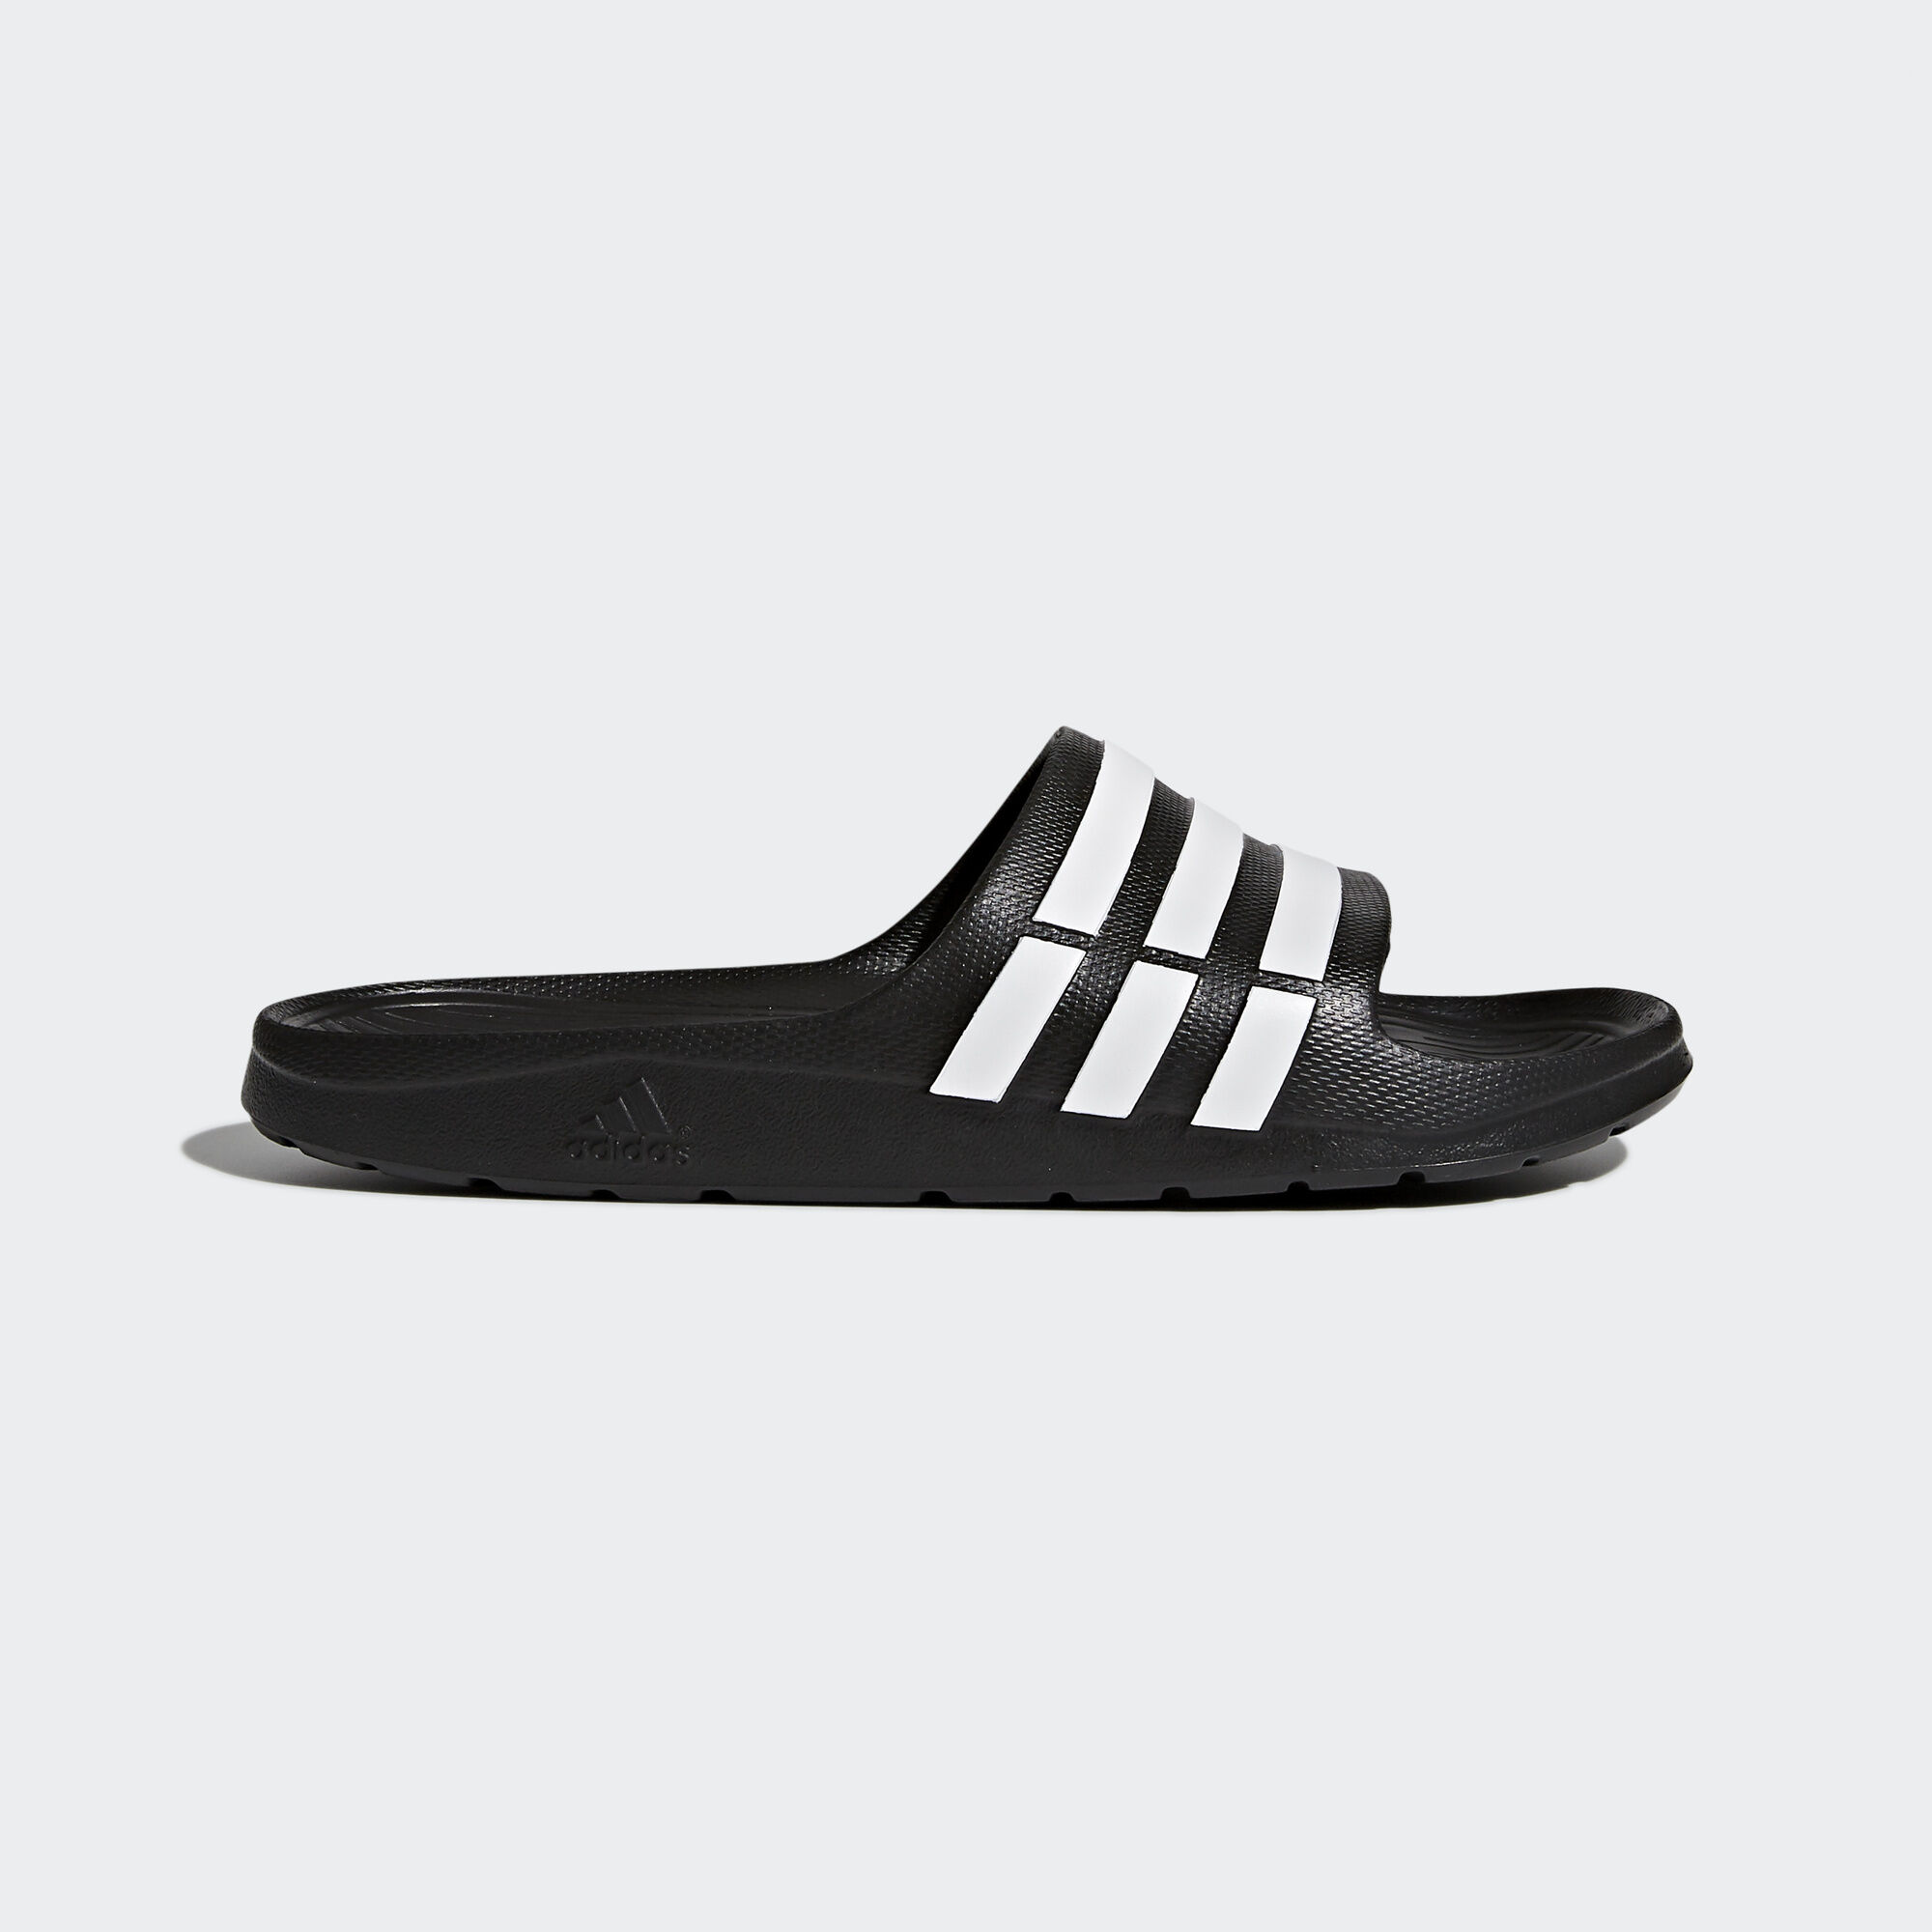 Color Core Black White Core Black Adidas Duramo  Shoes